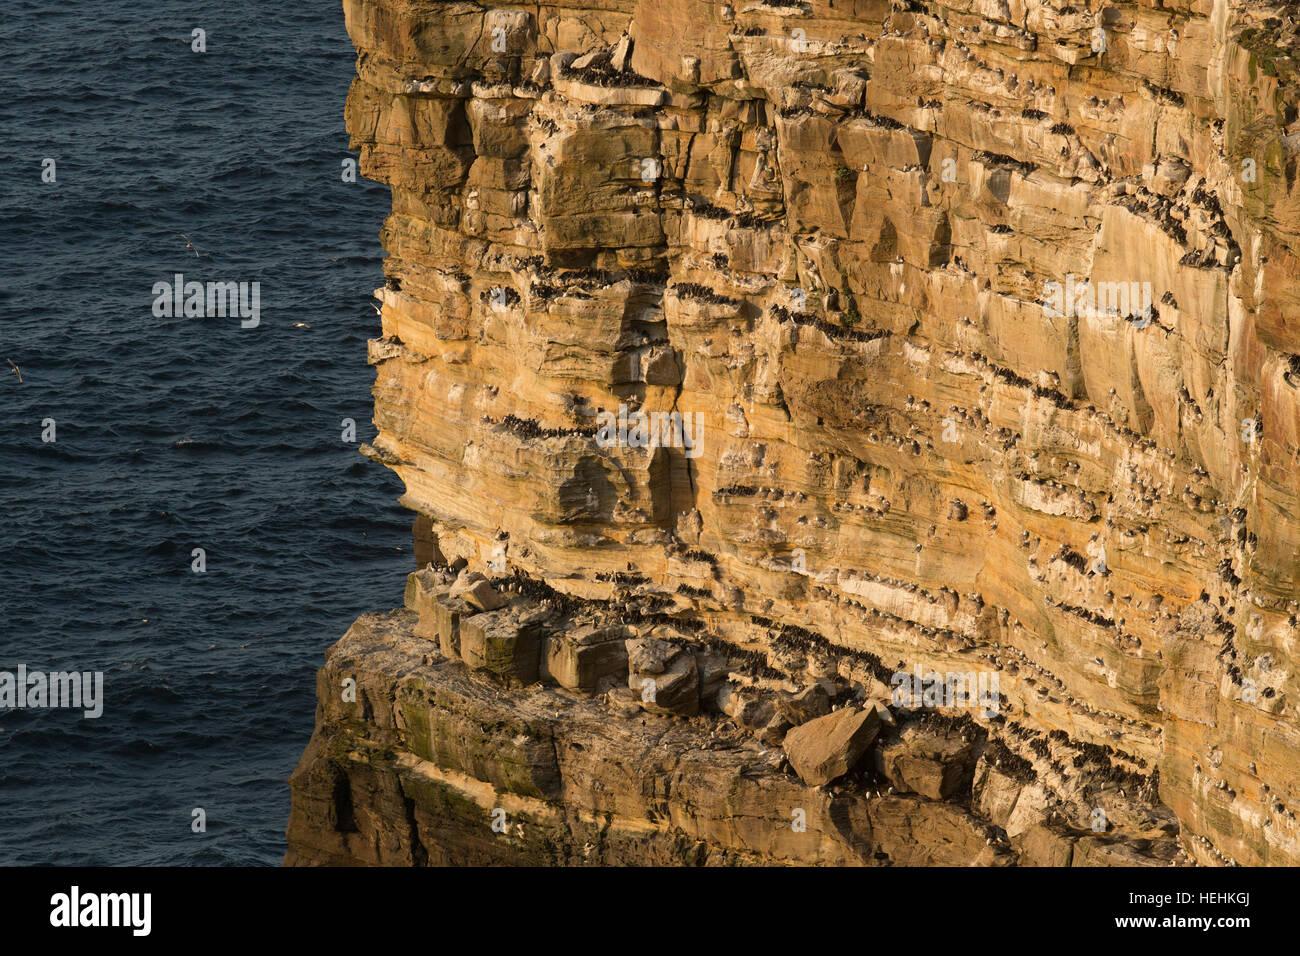 Seabirds; Colony; Dunnet Head; Scotland; UK - Stock Image